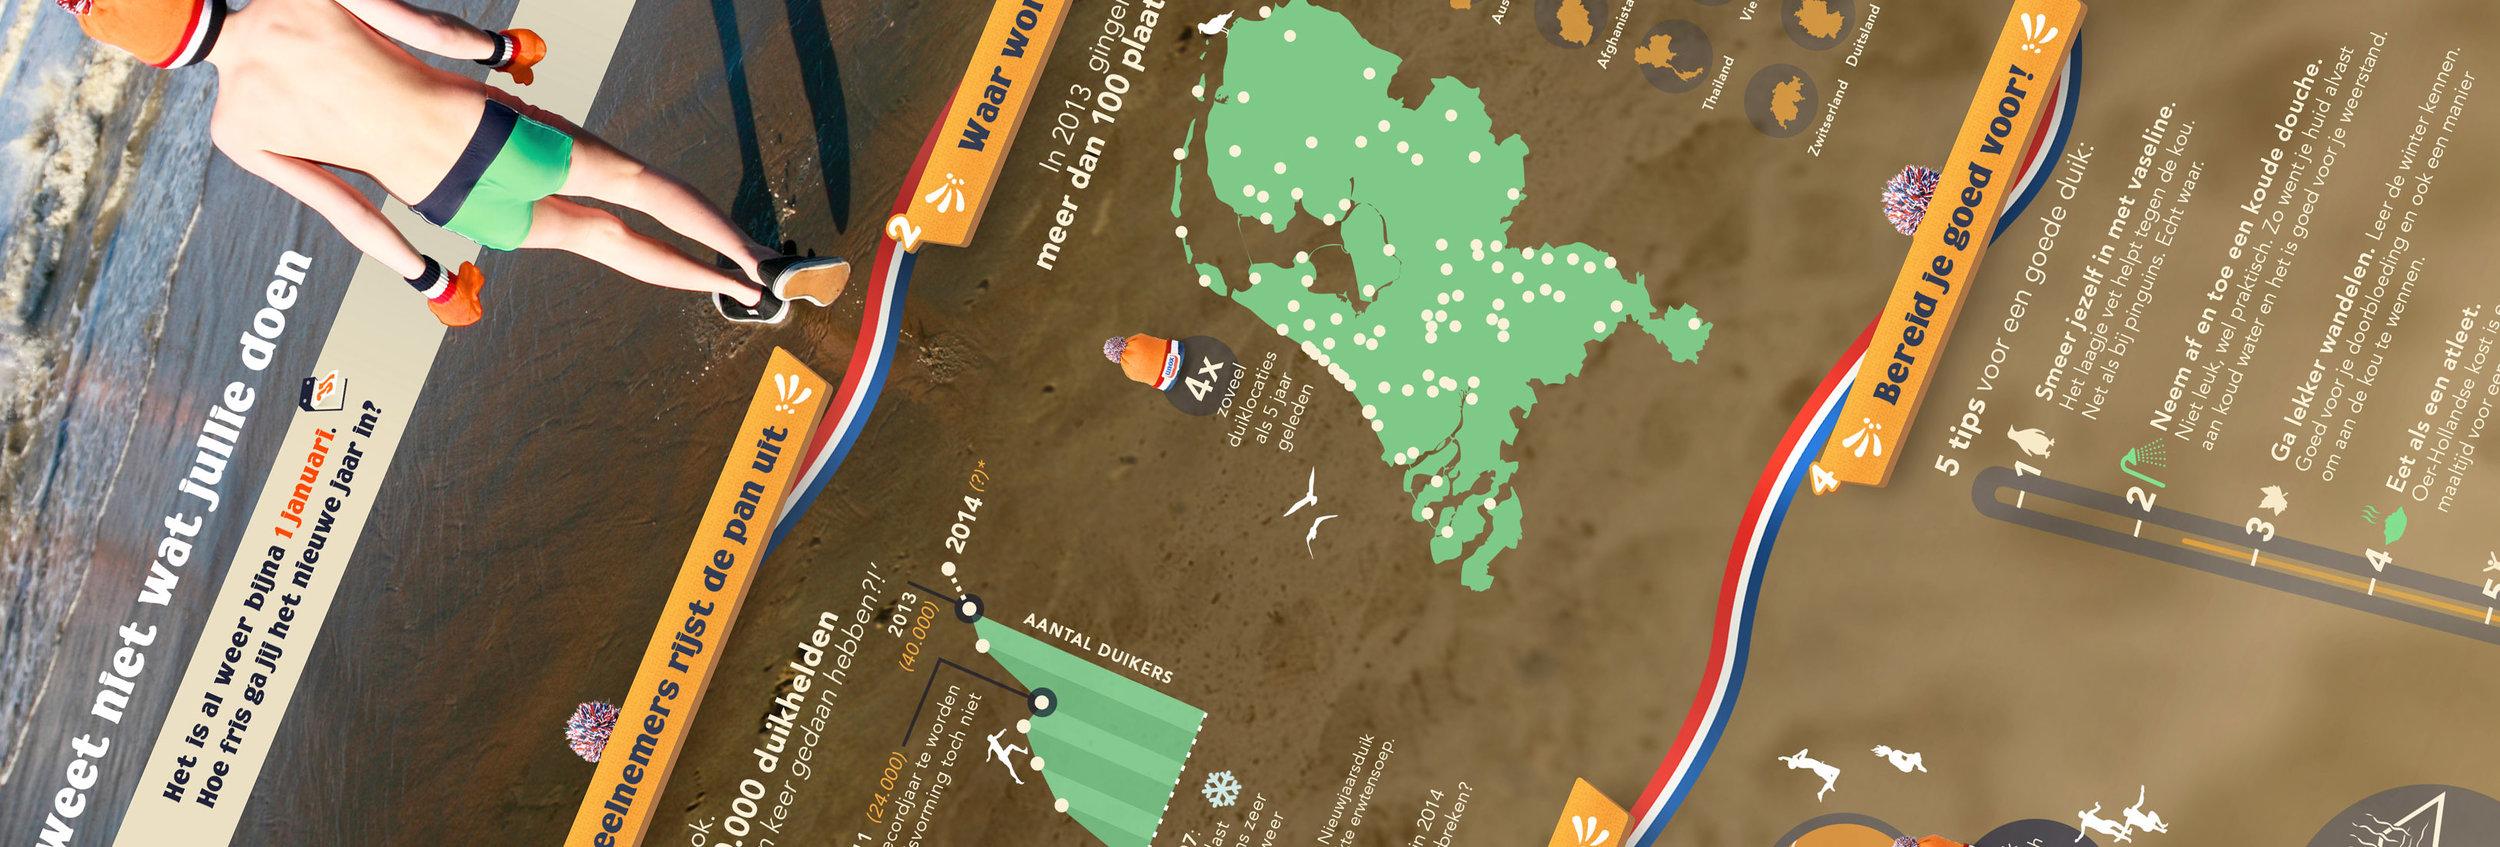 Infographic-Duik2014draai.jpg